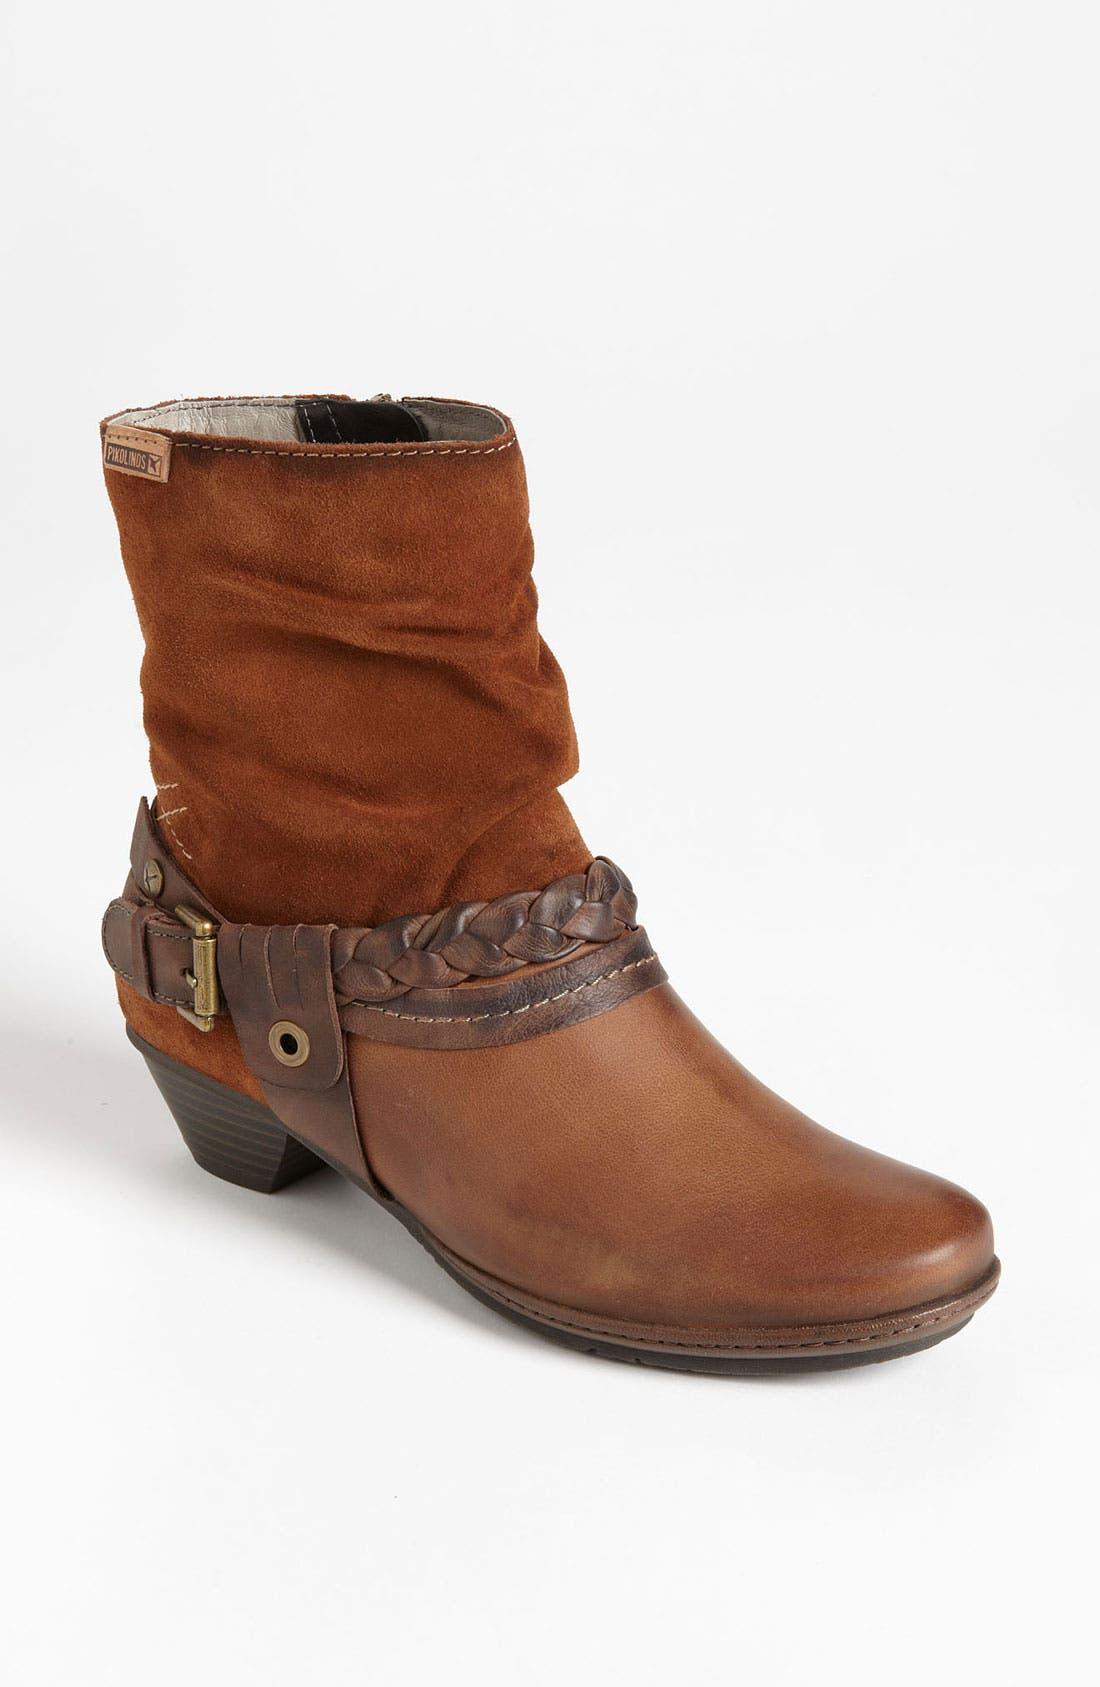 Main Image - PIKOLINOS 'Brujas' Boot